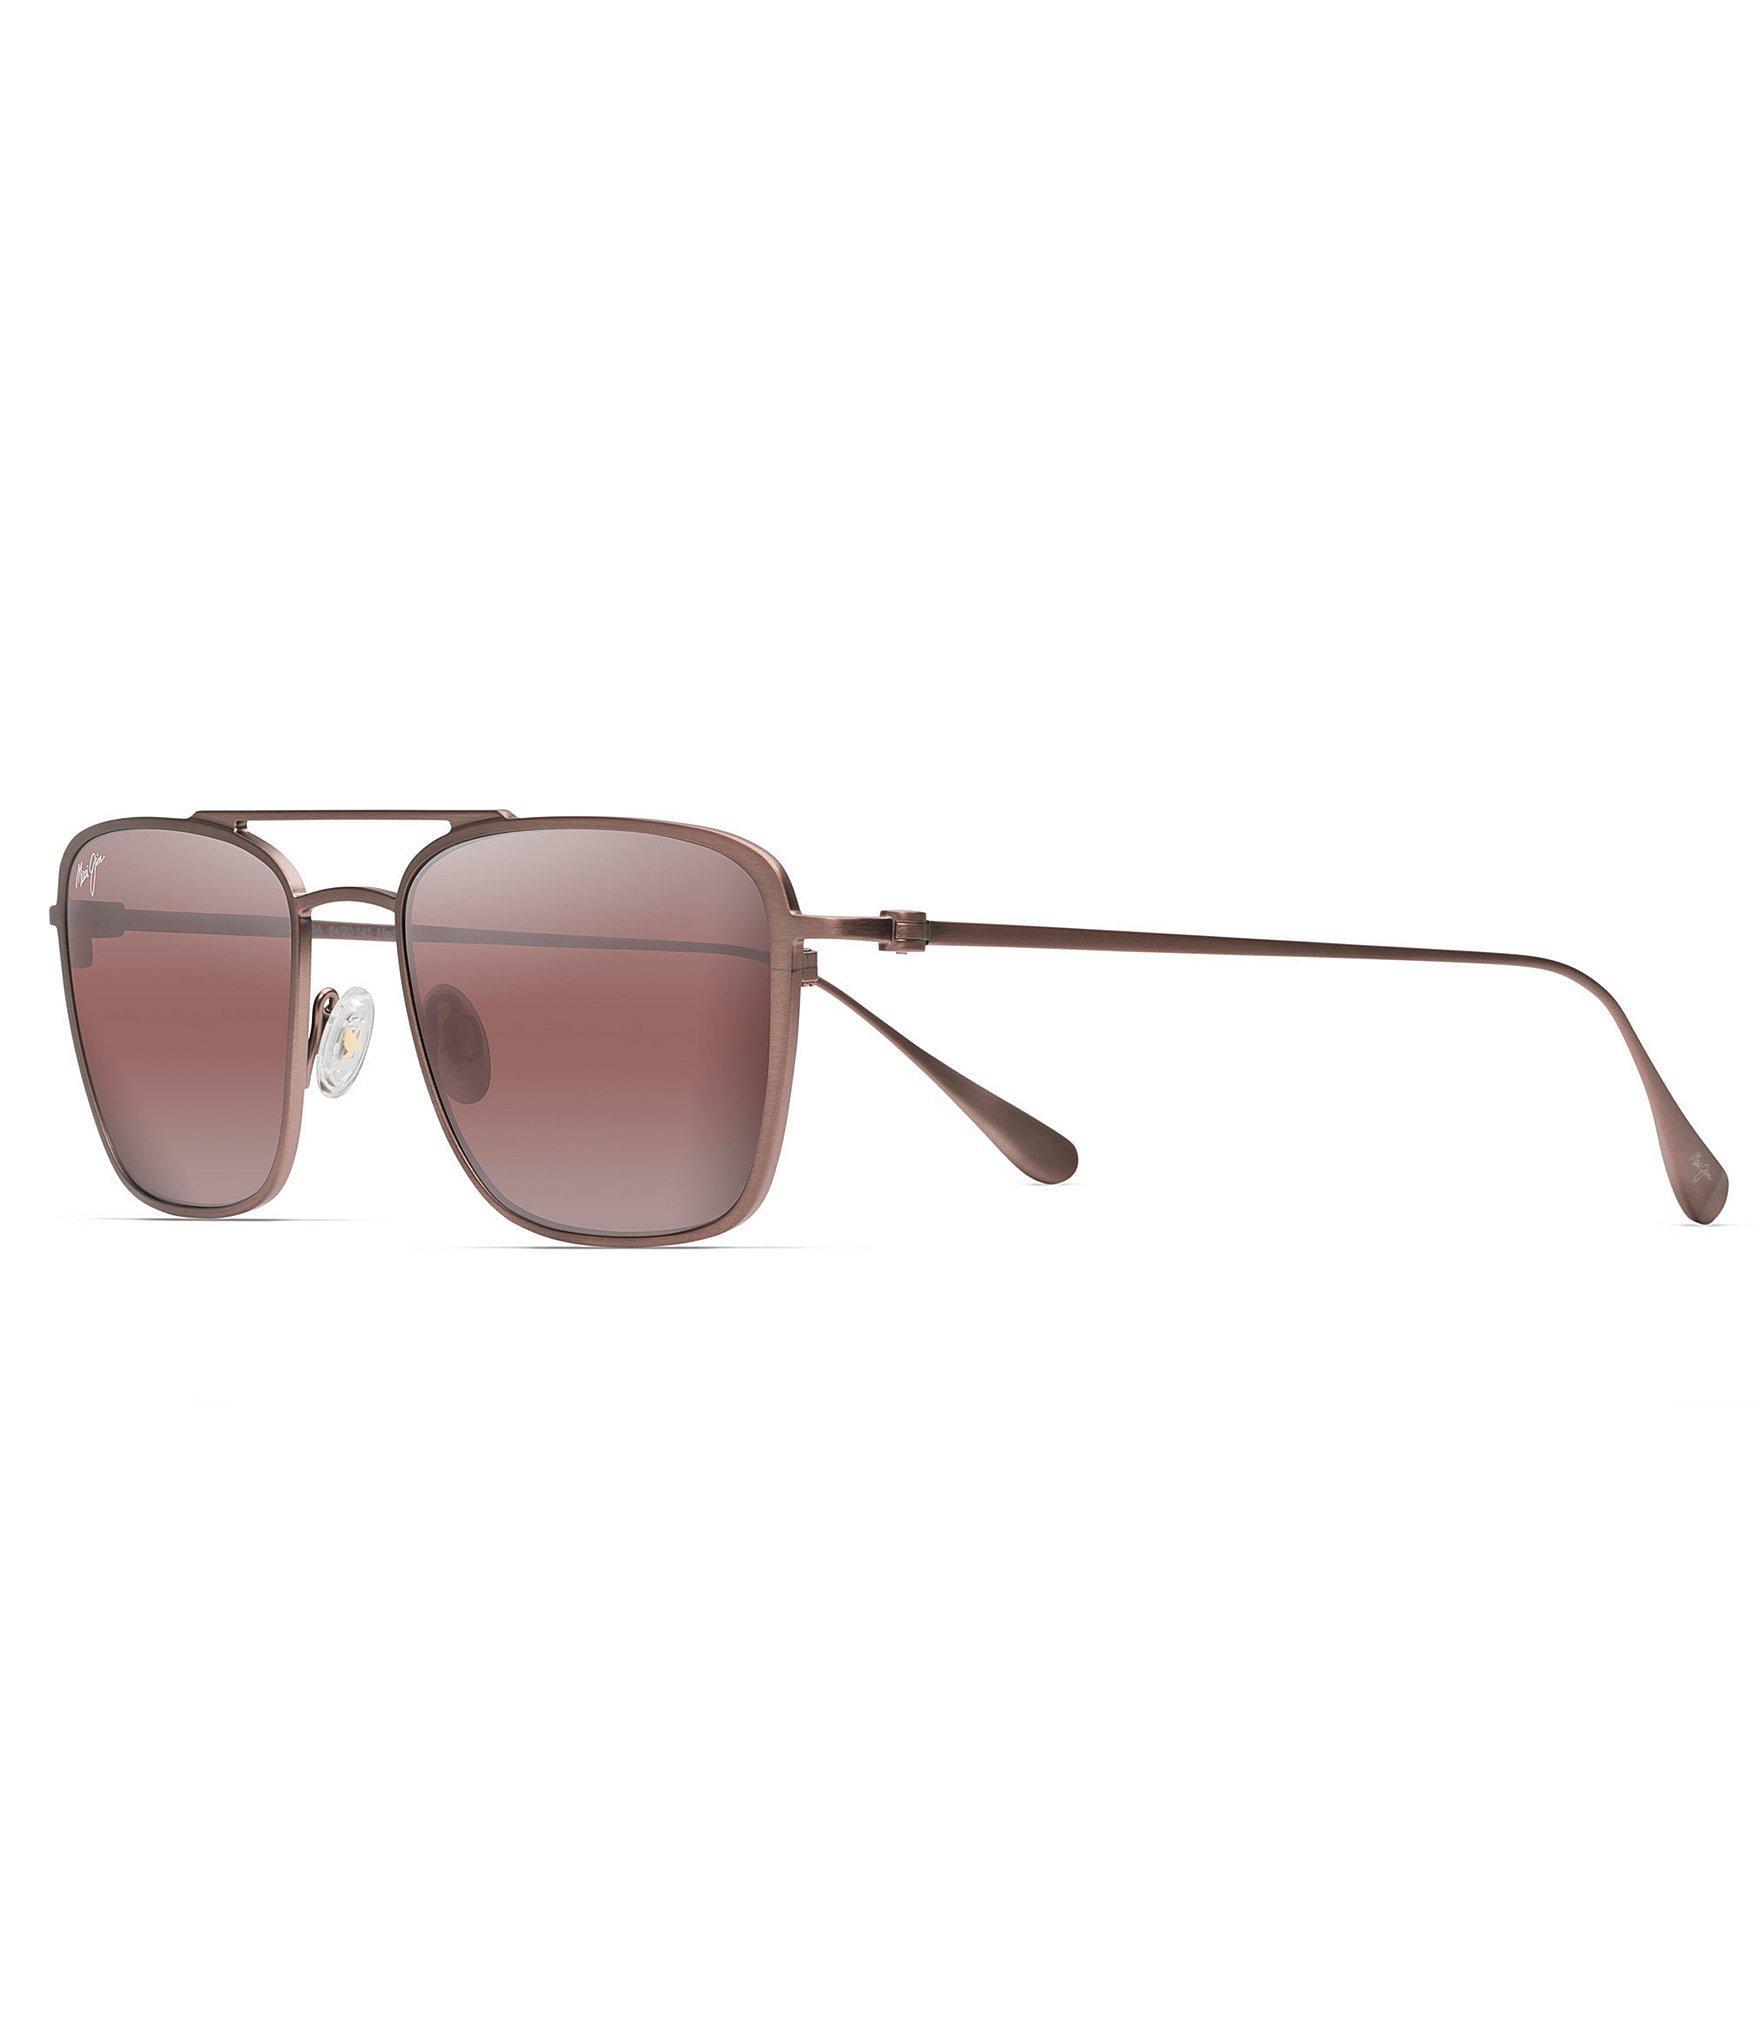 450903b5086c Lyst - Maui Jim Ebb & Flow Polarized Aviator Sunglasses in Brown for Men